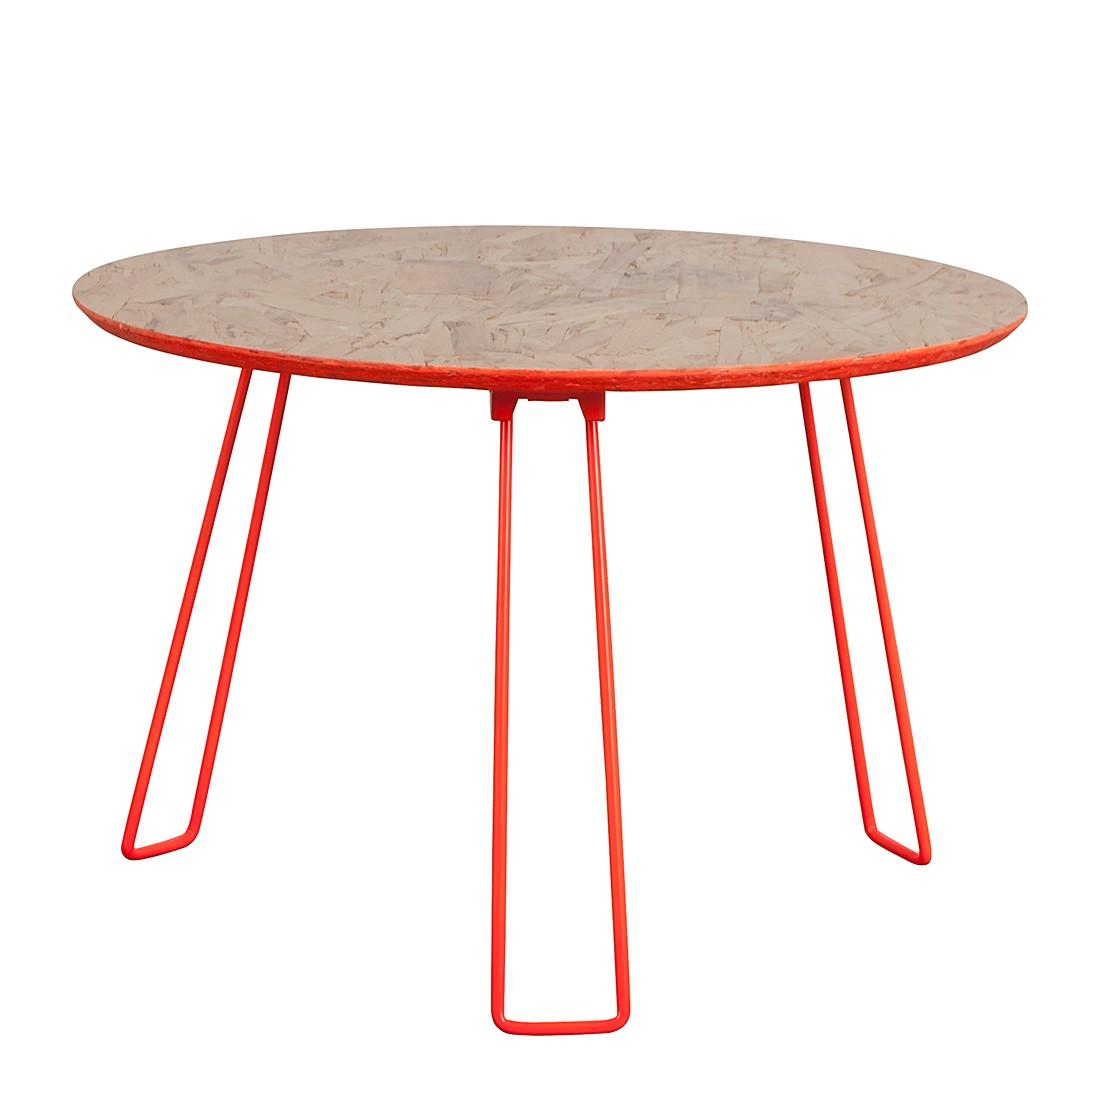 Tavolino Osb L - Arancione fluo, Zuiver